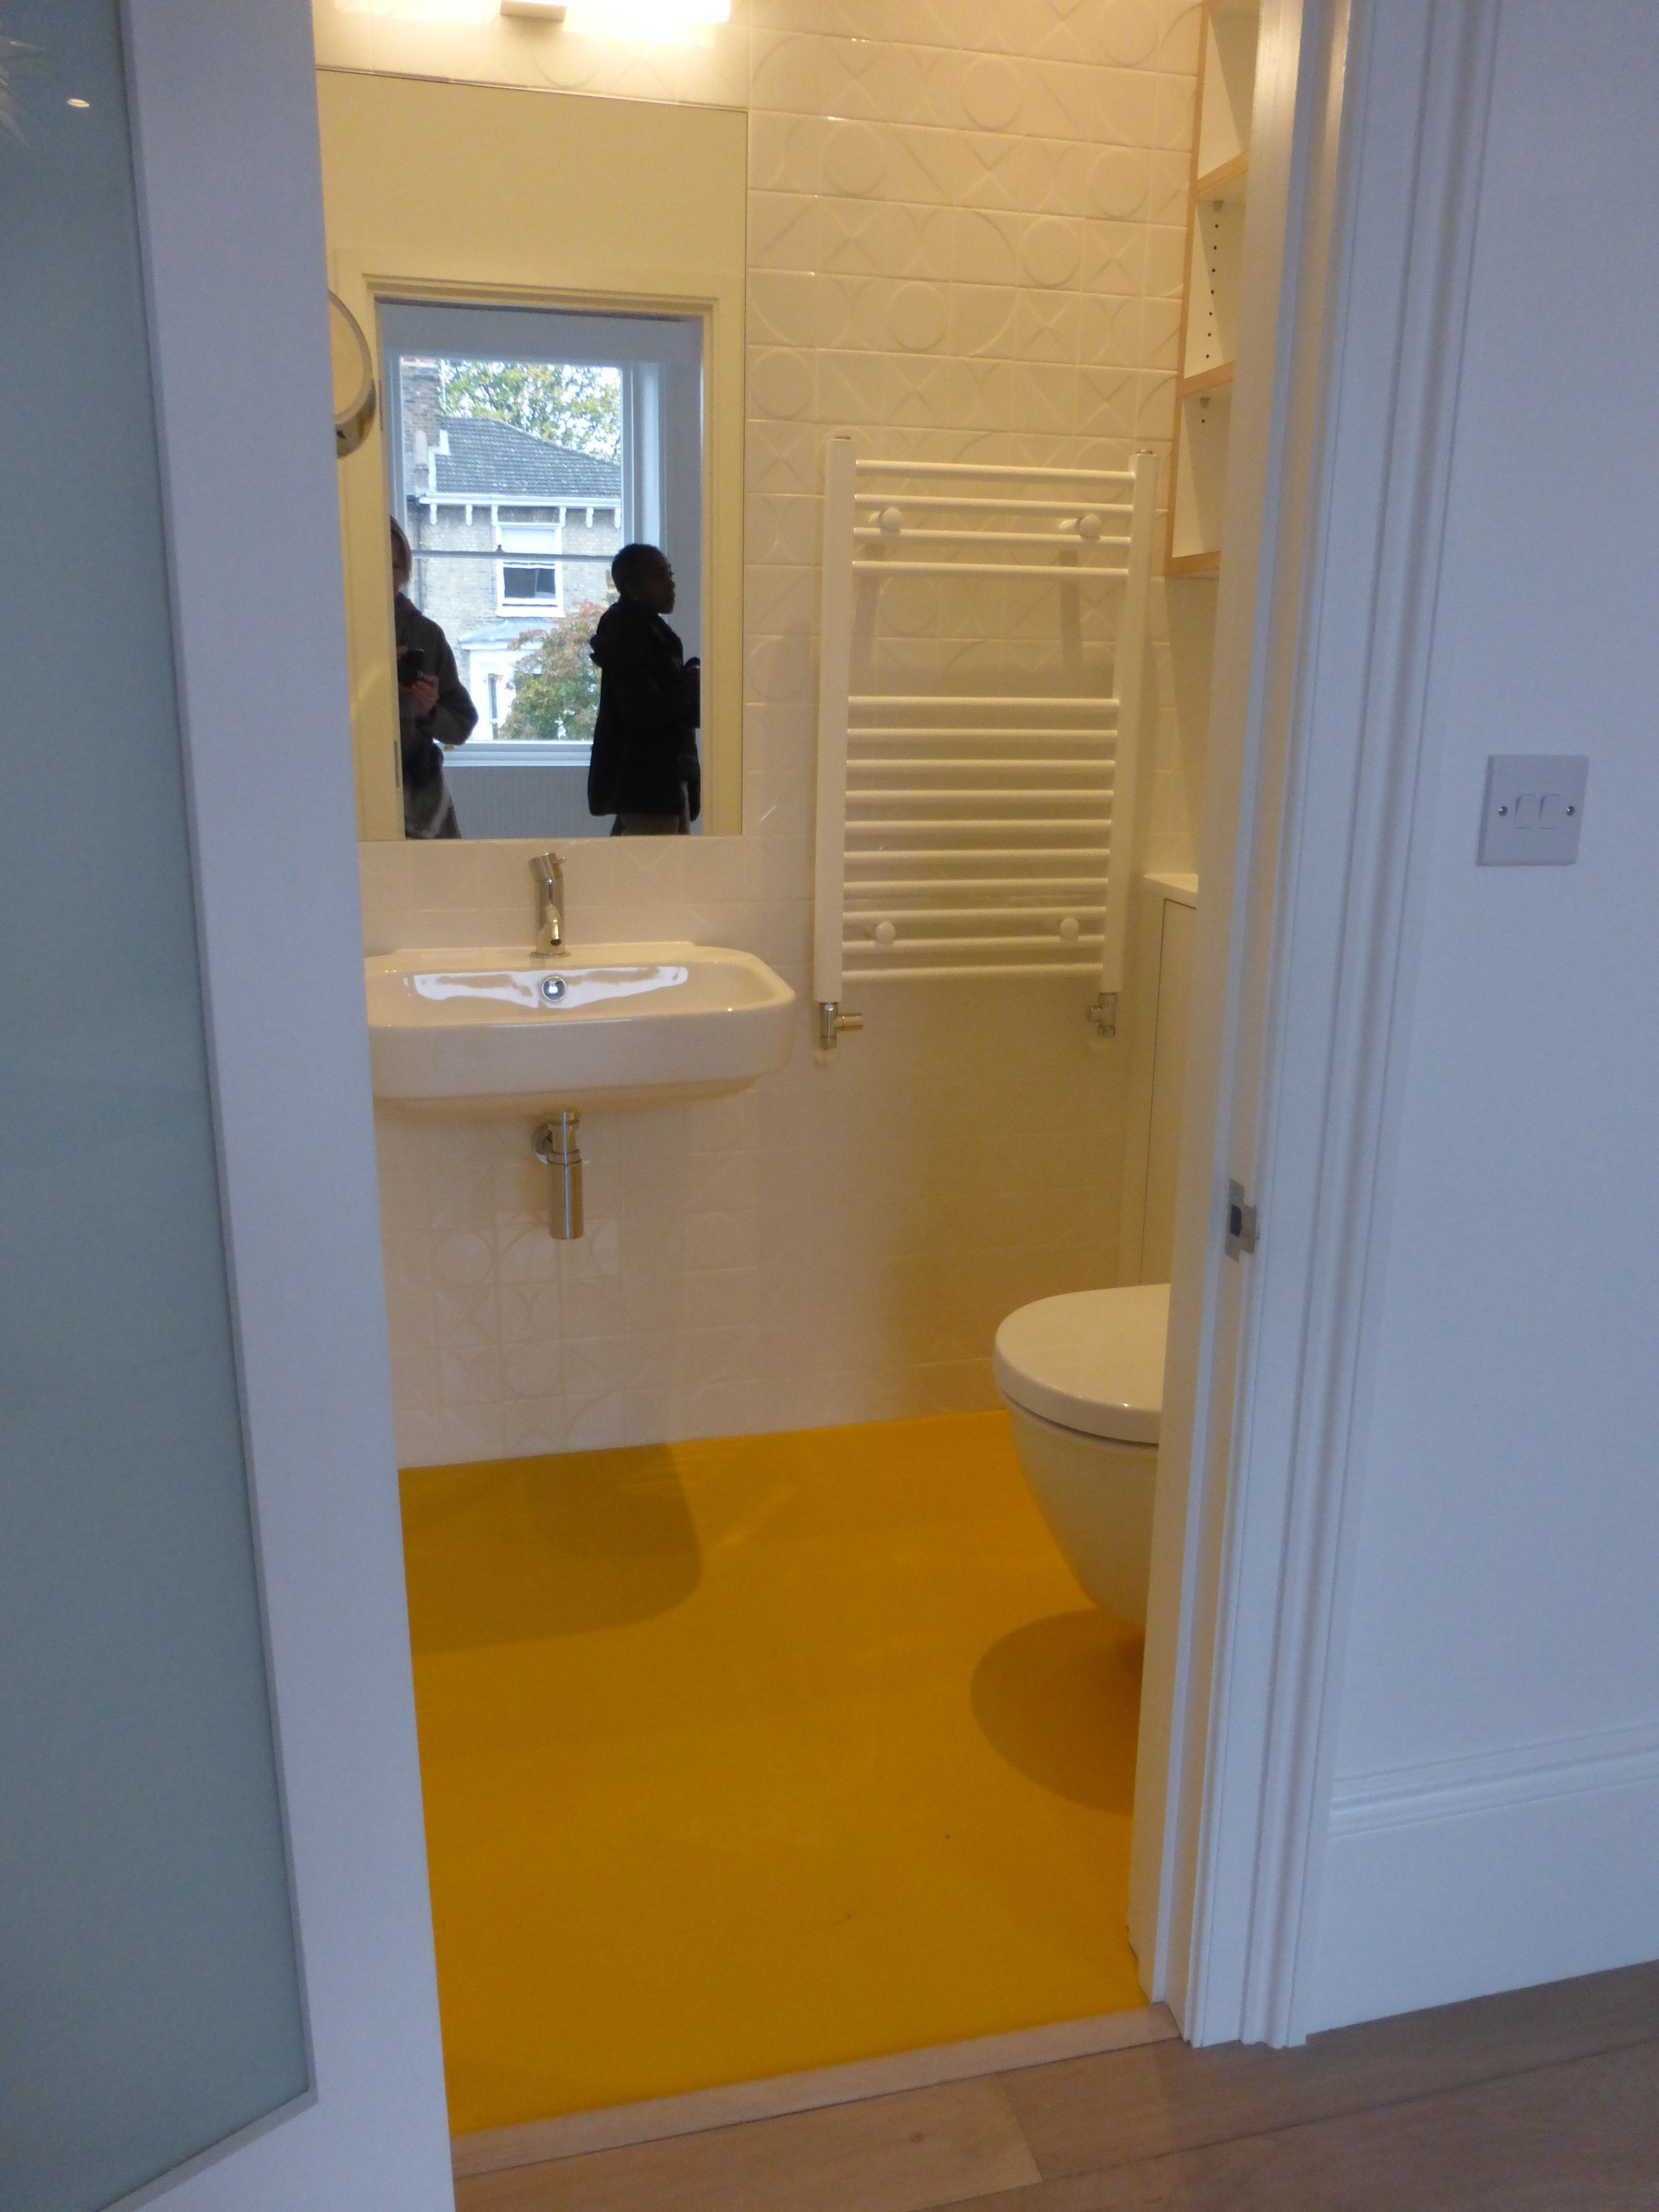 Springfield Yellow Rubber Bathroom flooring, bright